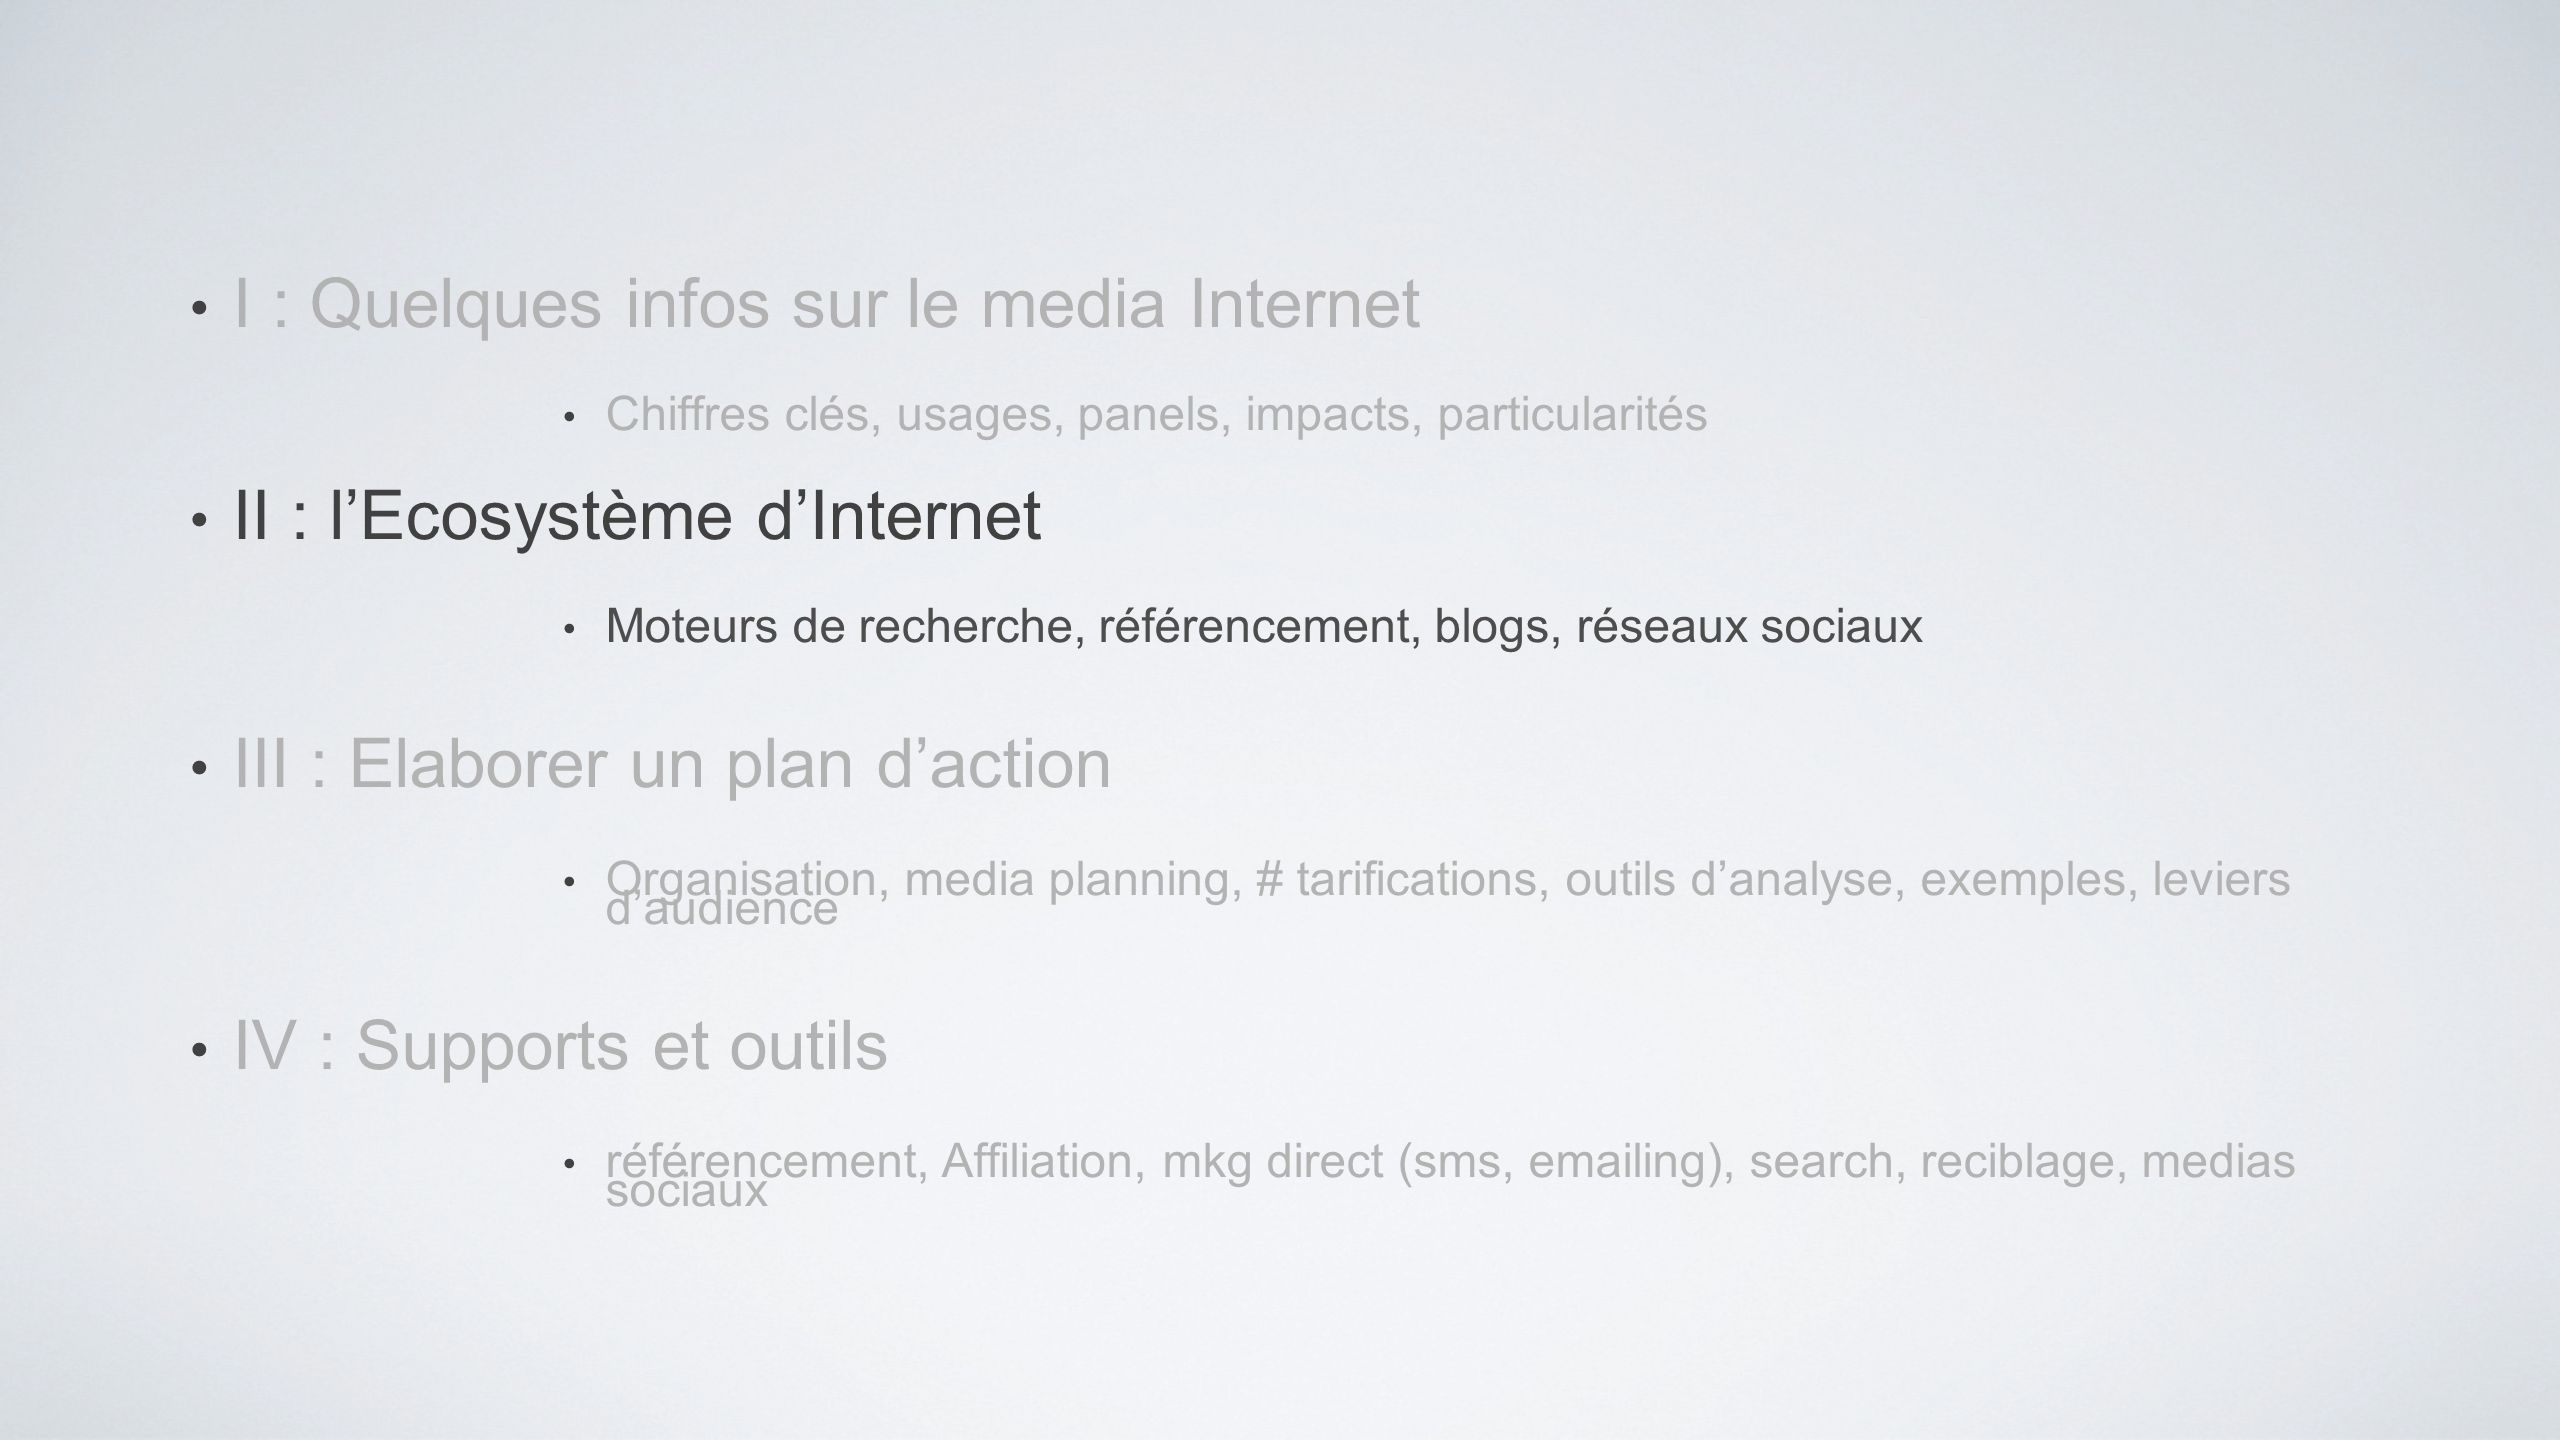 I : Quelques infos sur le media Internet II : l'Ecosystème d'Internet